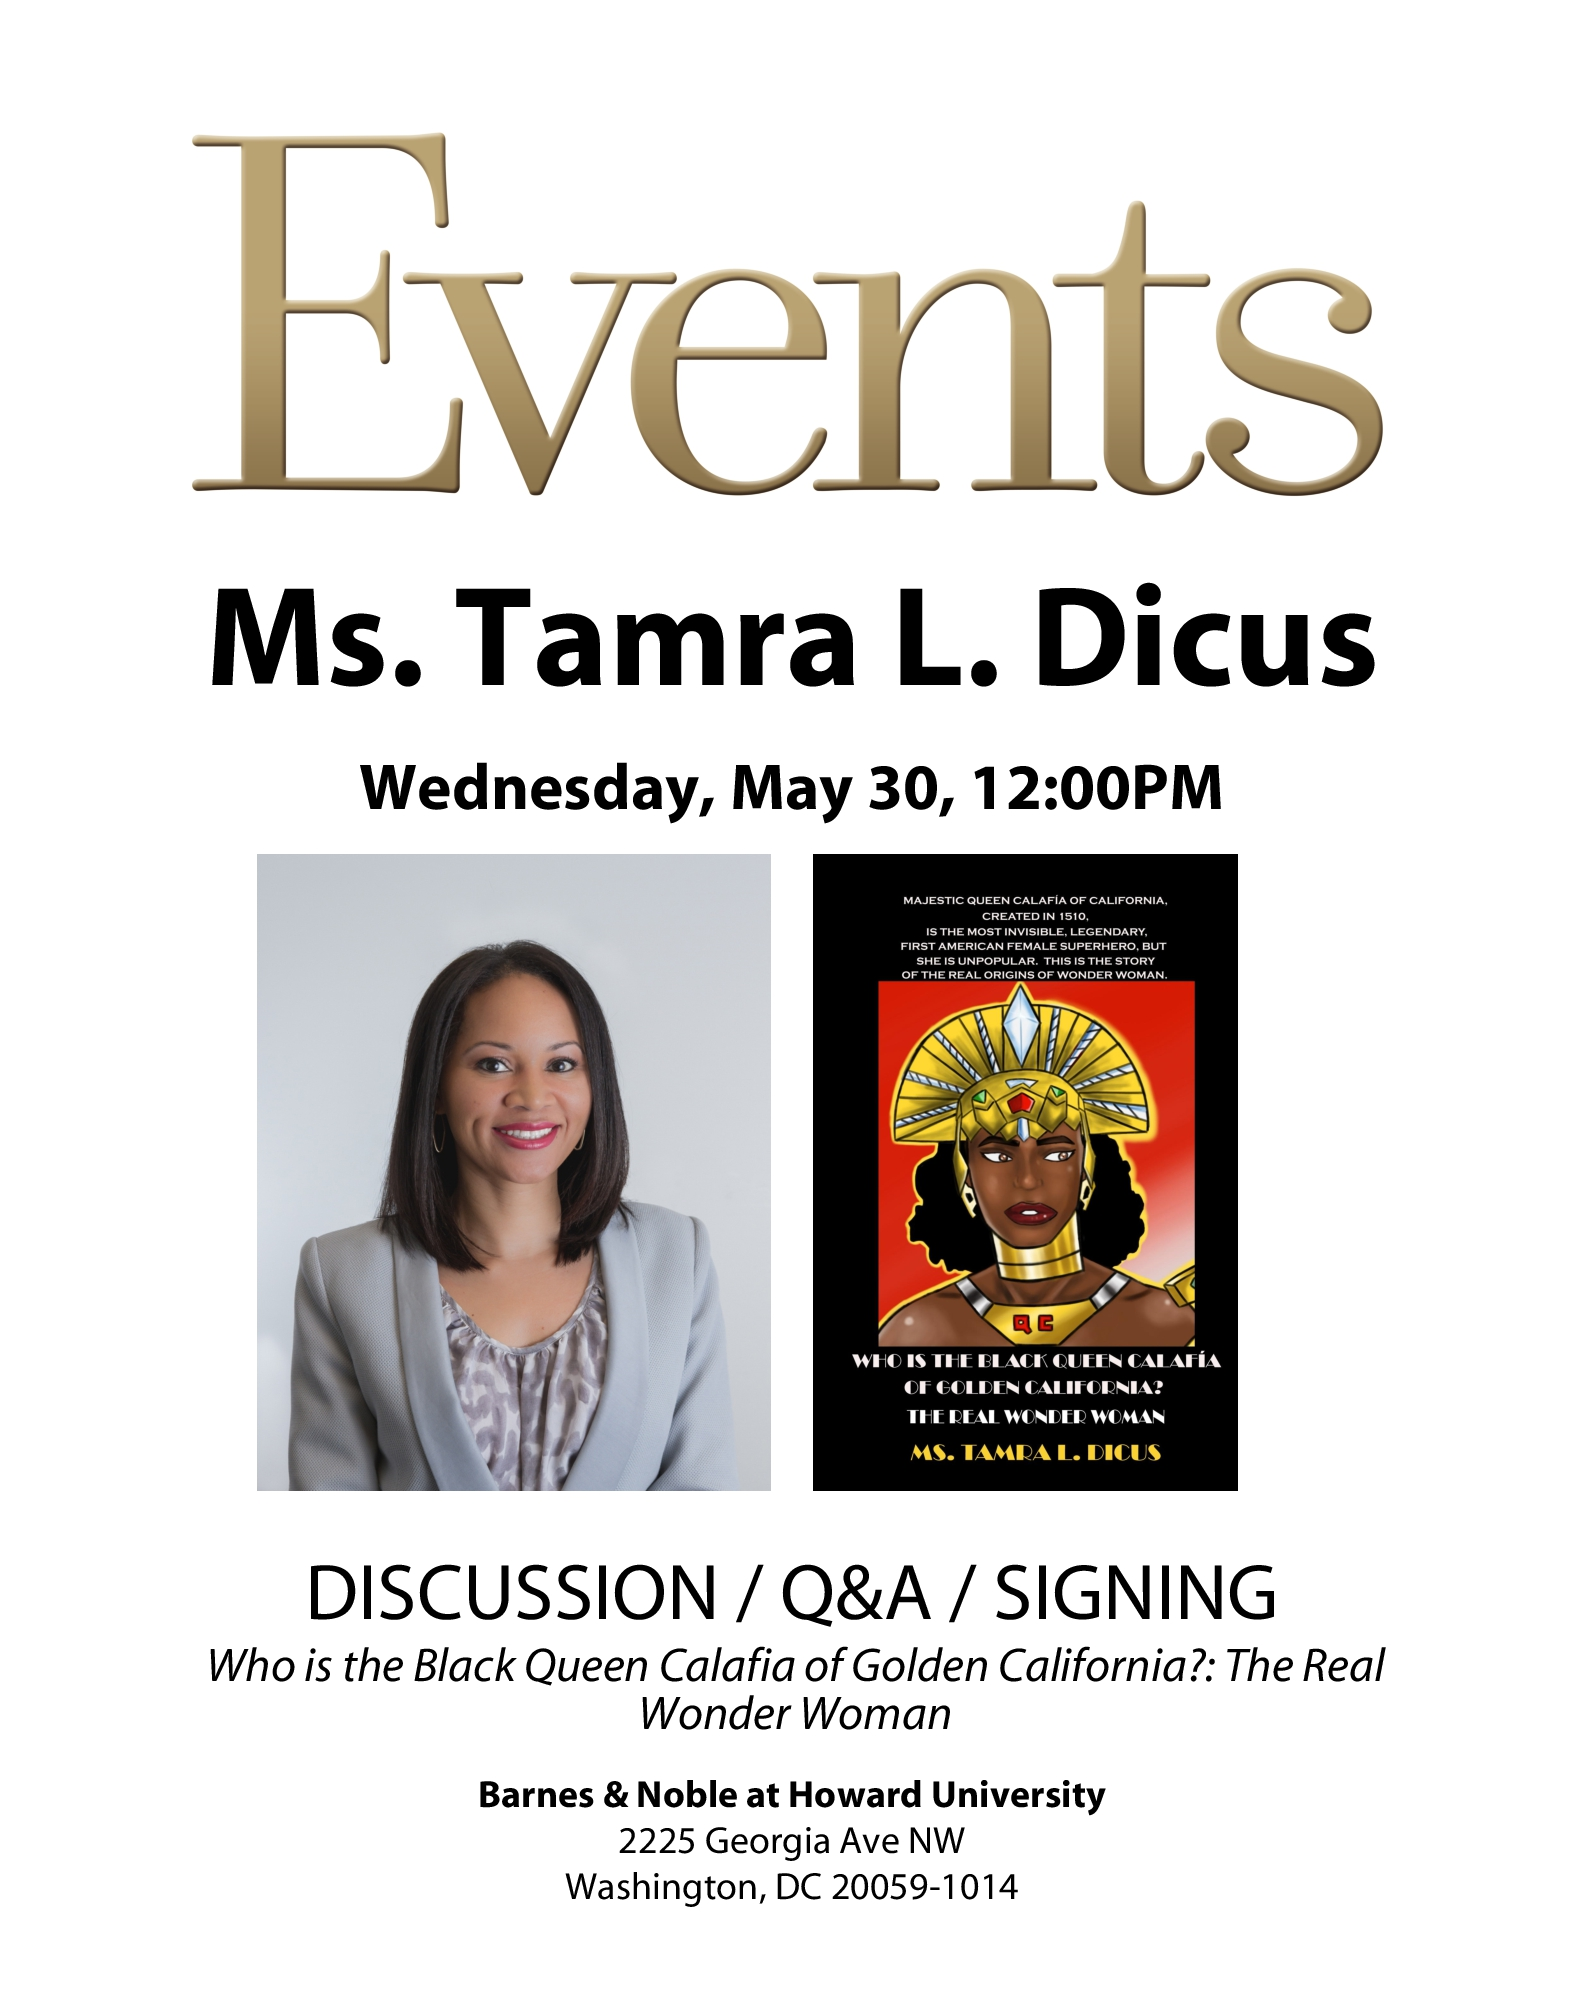 Dicus BN Howard University bookstore event flyer.jpg